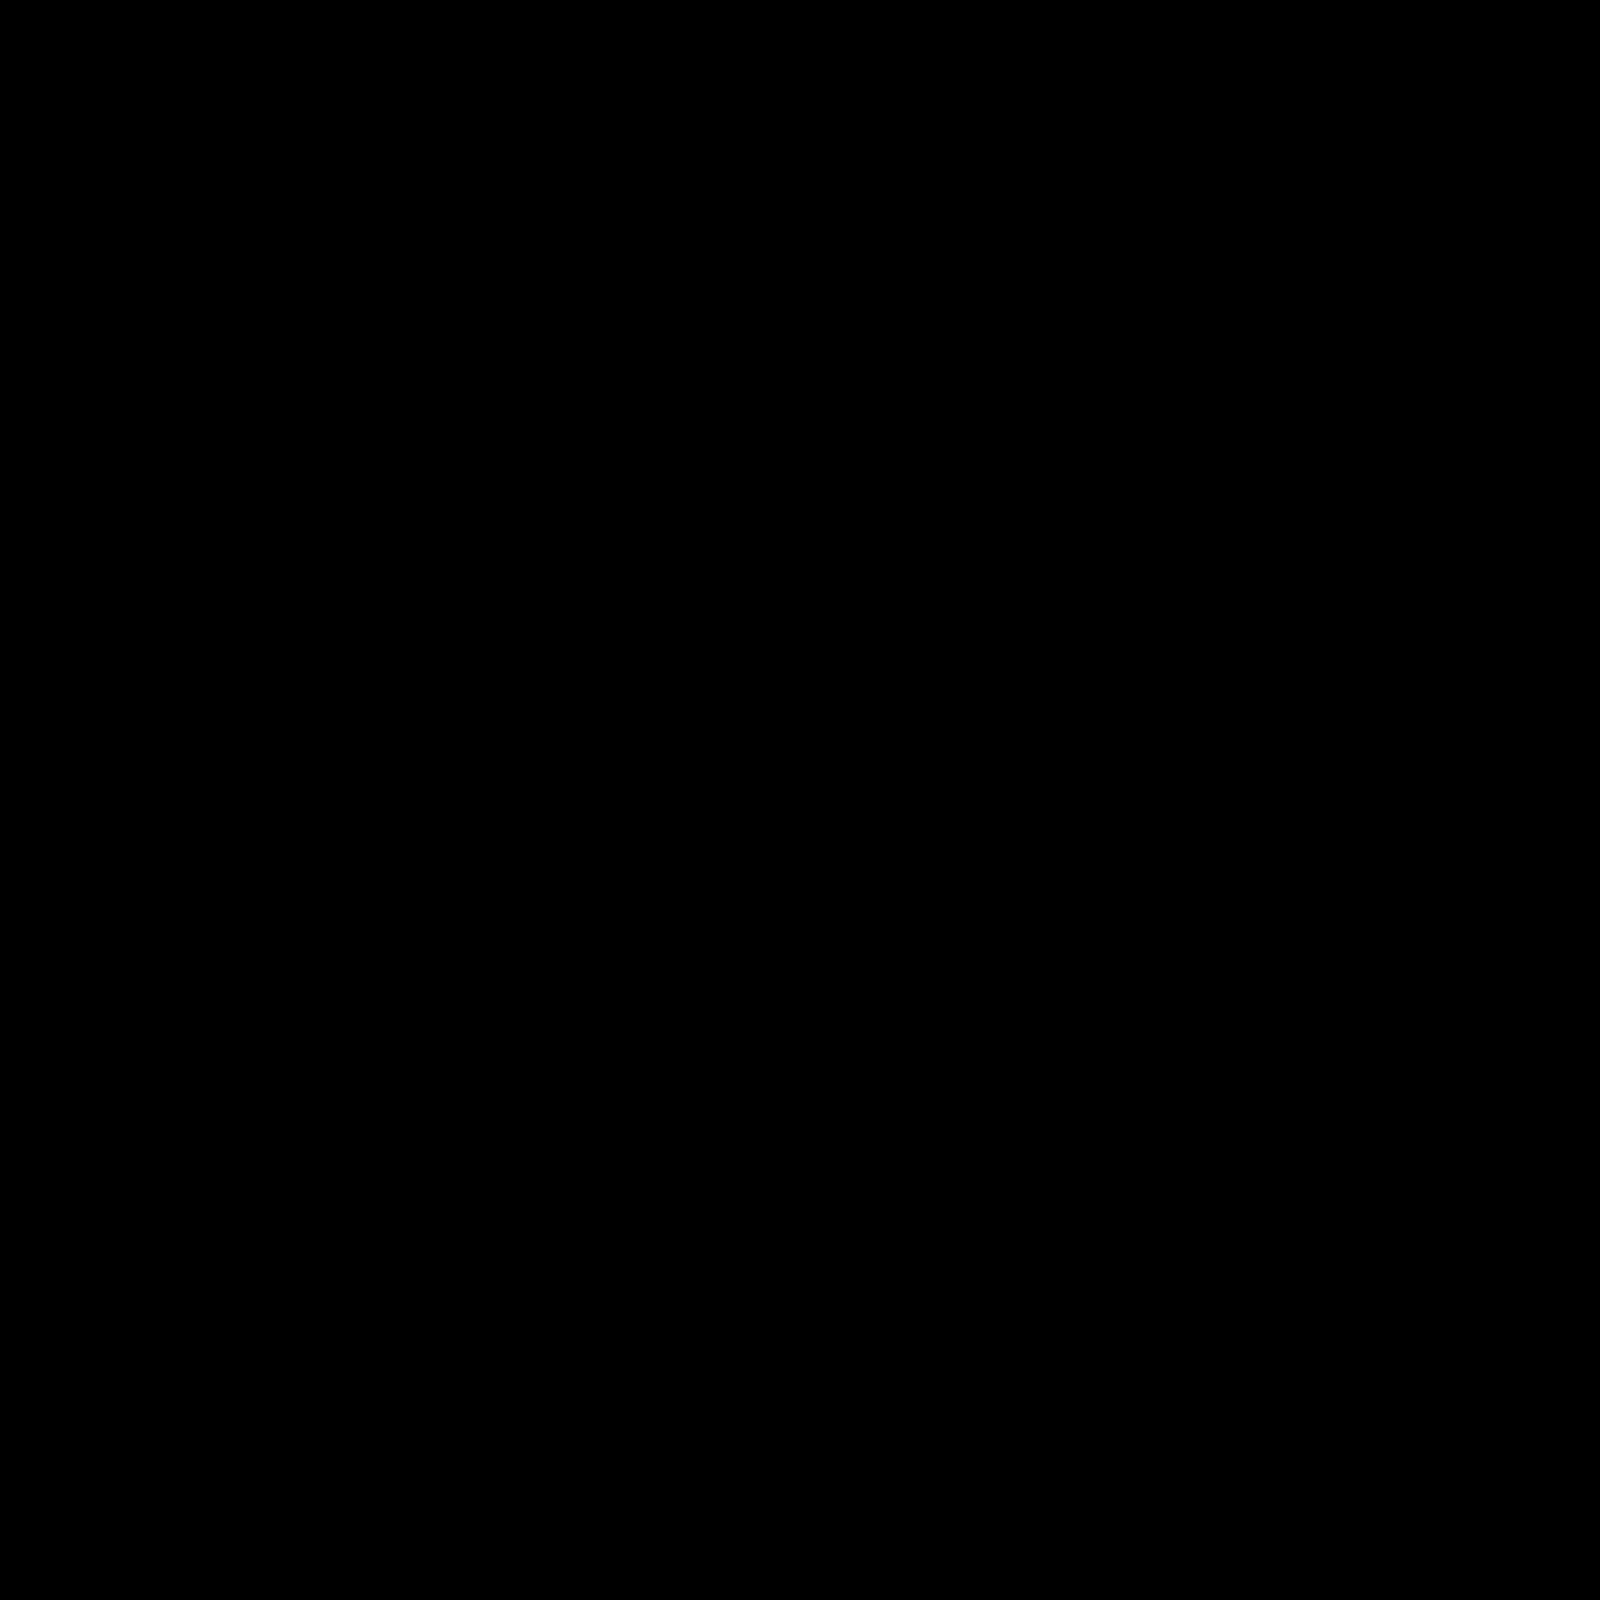 Windows XP Filled icon